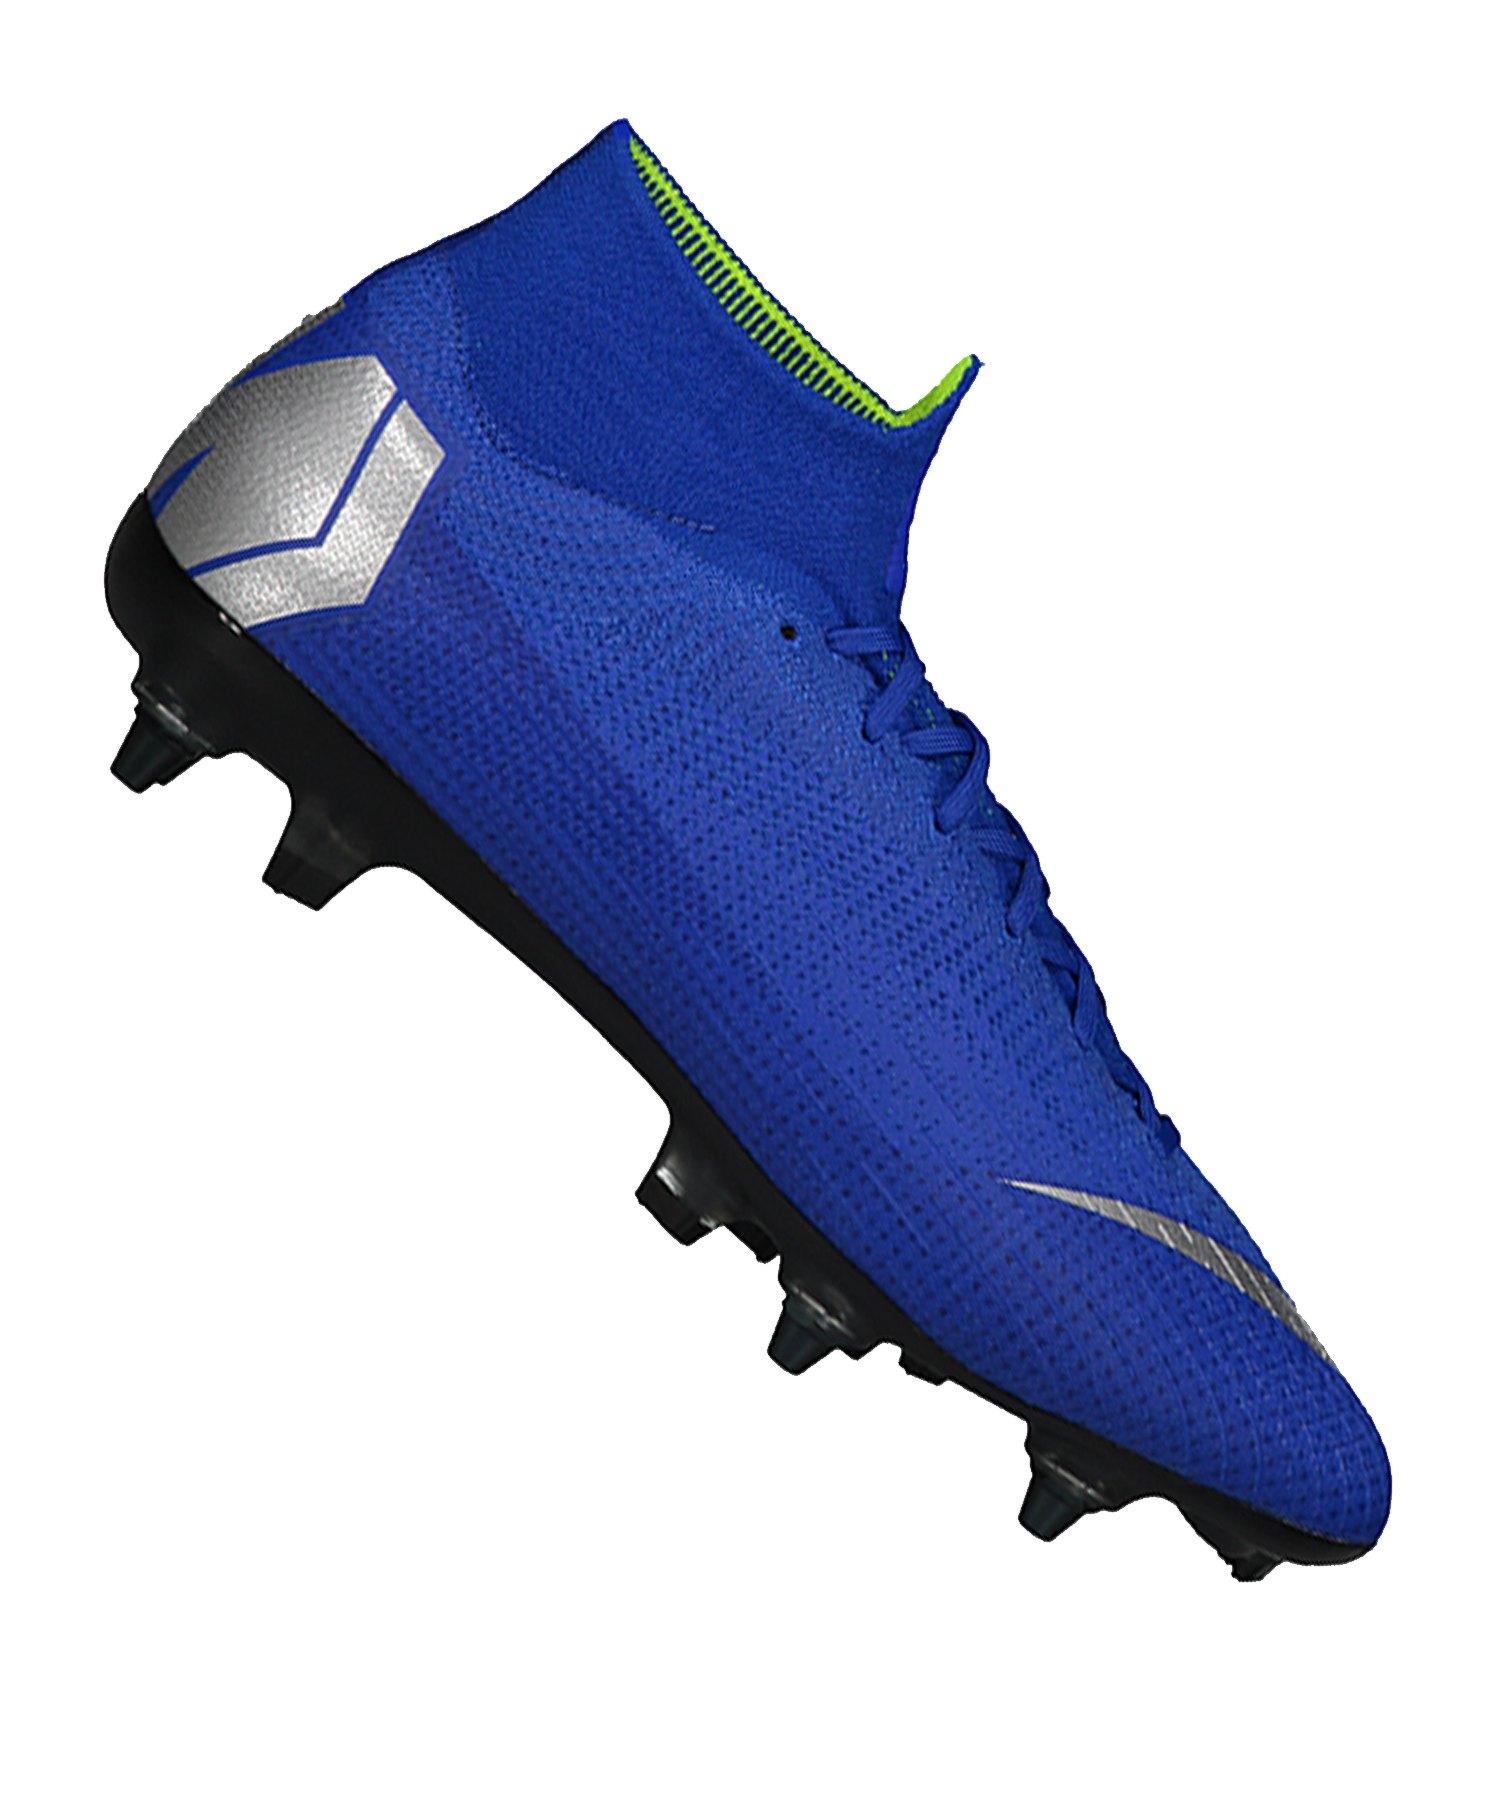 new product 2ffde b0df5 Nike Mercurial Superfly VI Elite SG-Pro AC F400